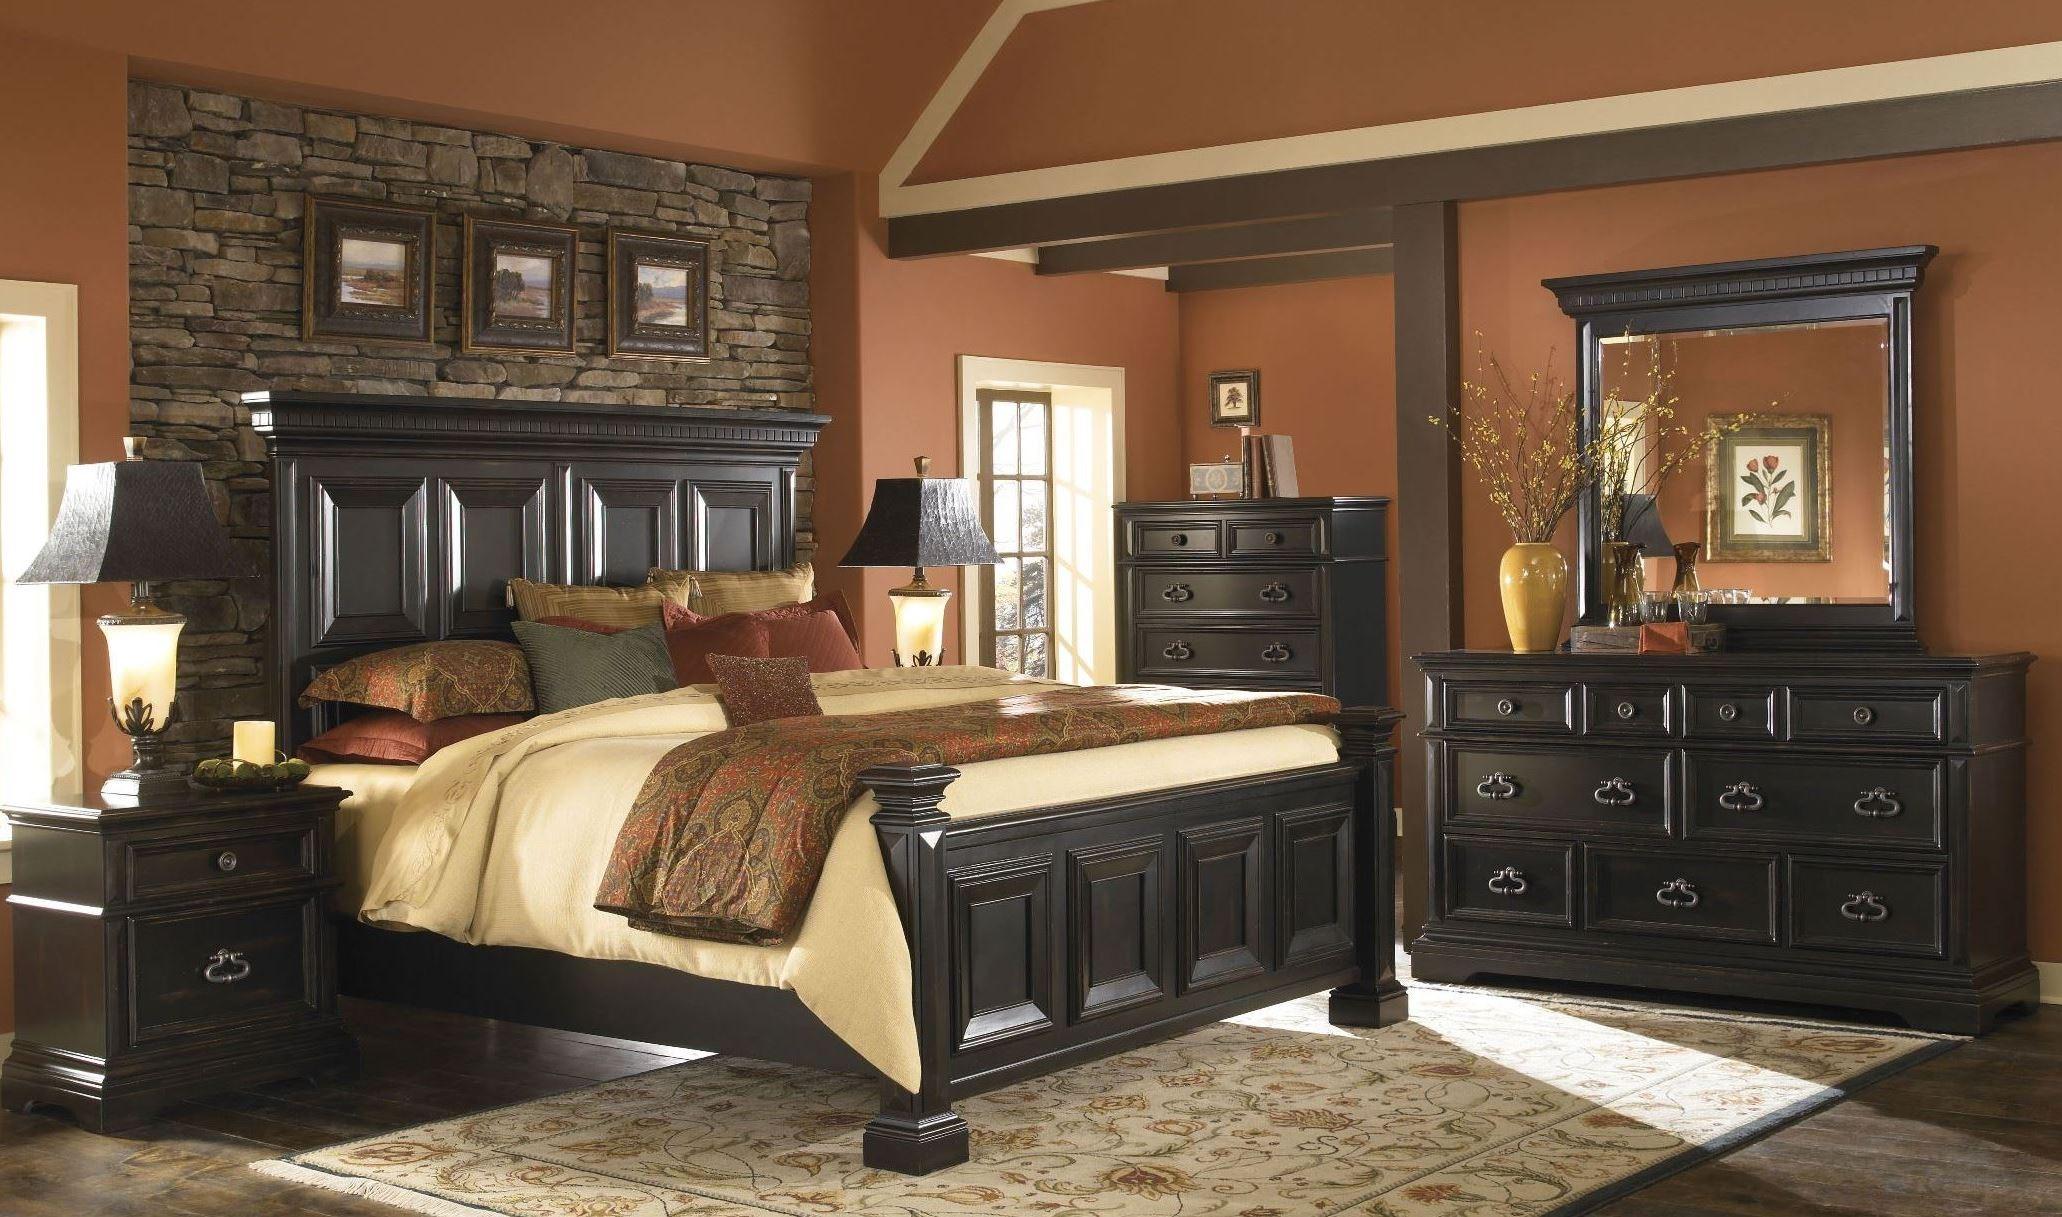 Brookfield Bedroom Set From Pulaski 9931 Coleman Furniture